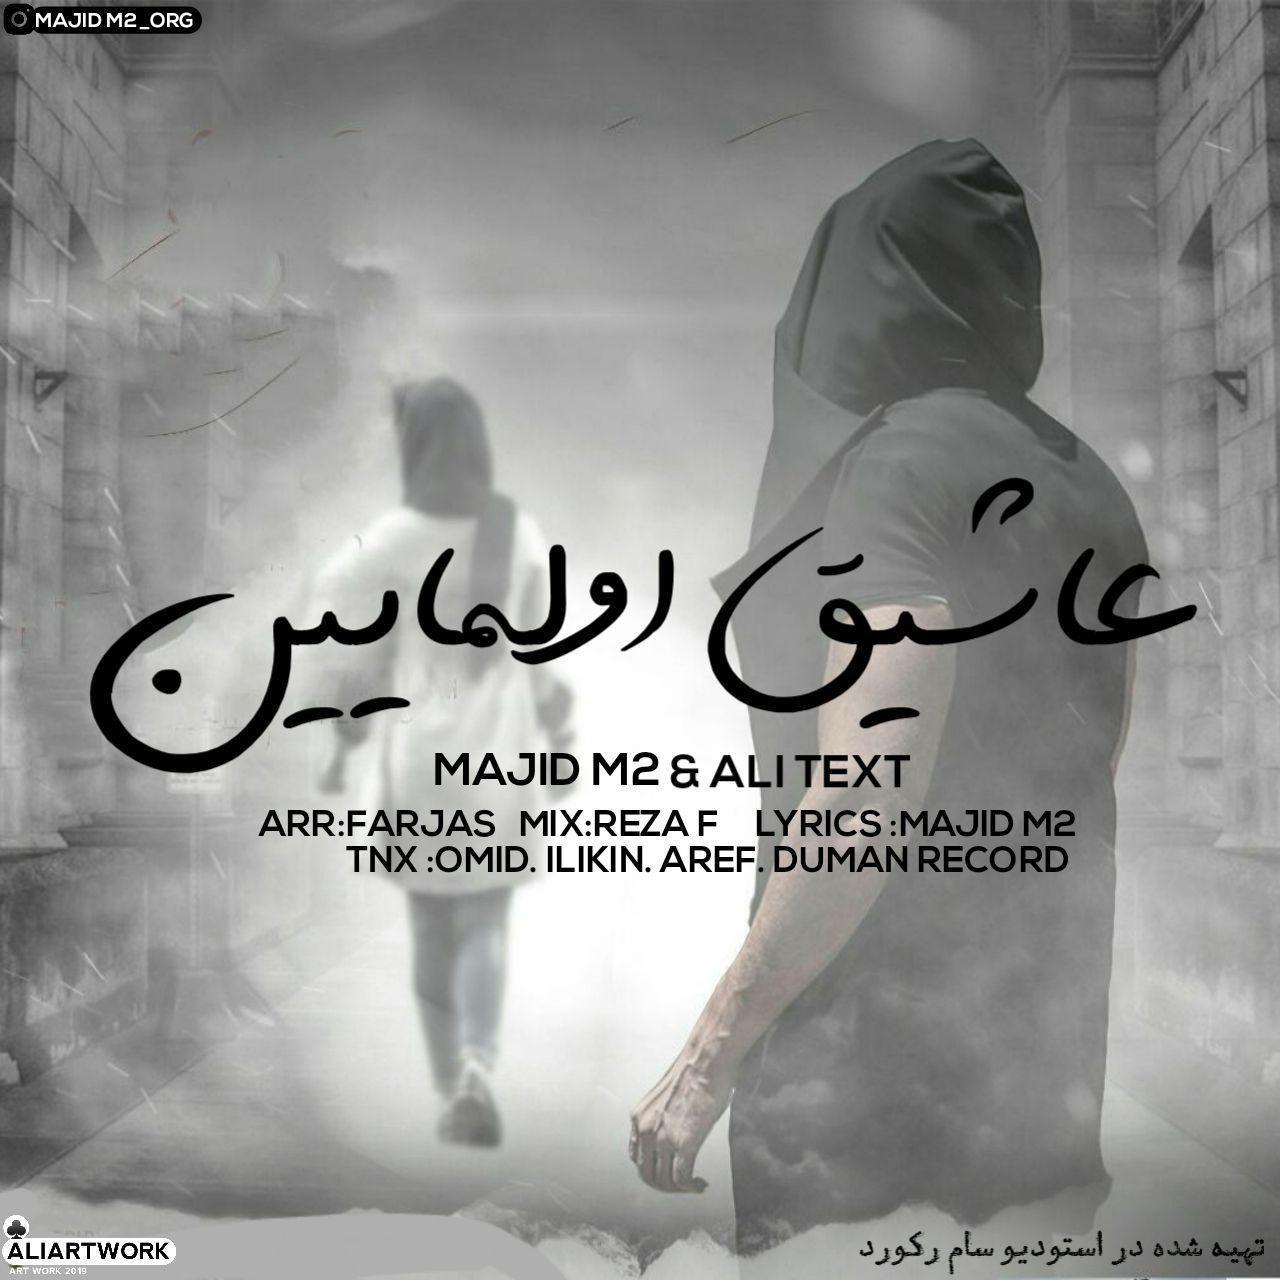 http://s2.picofile.com/file/8374788184/14Majid_M2_Feat_Ali_Text_Ashigh_Olmayin.jpg